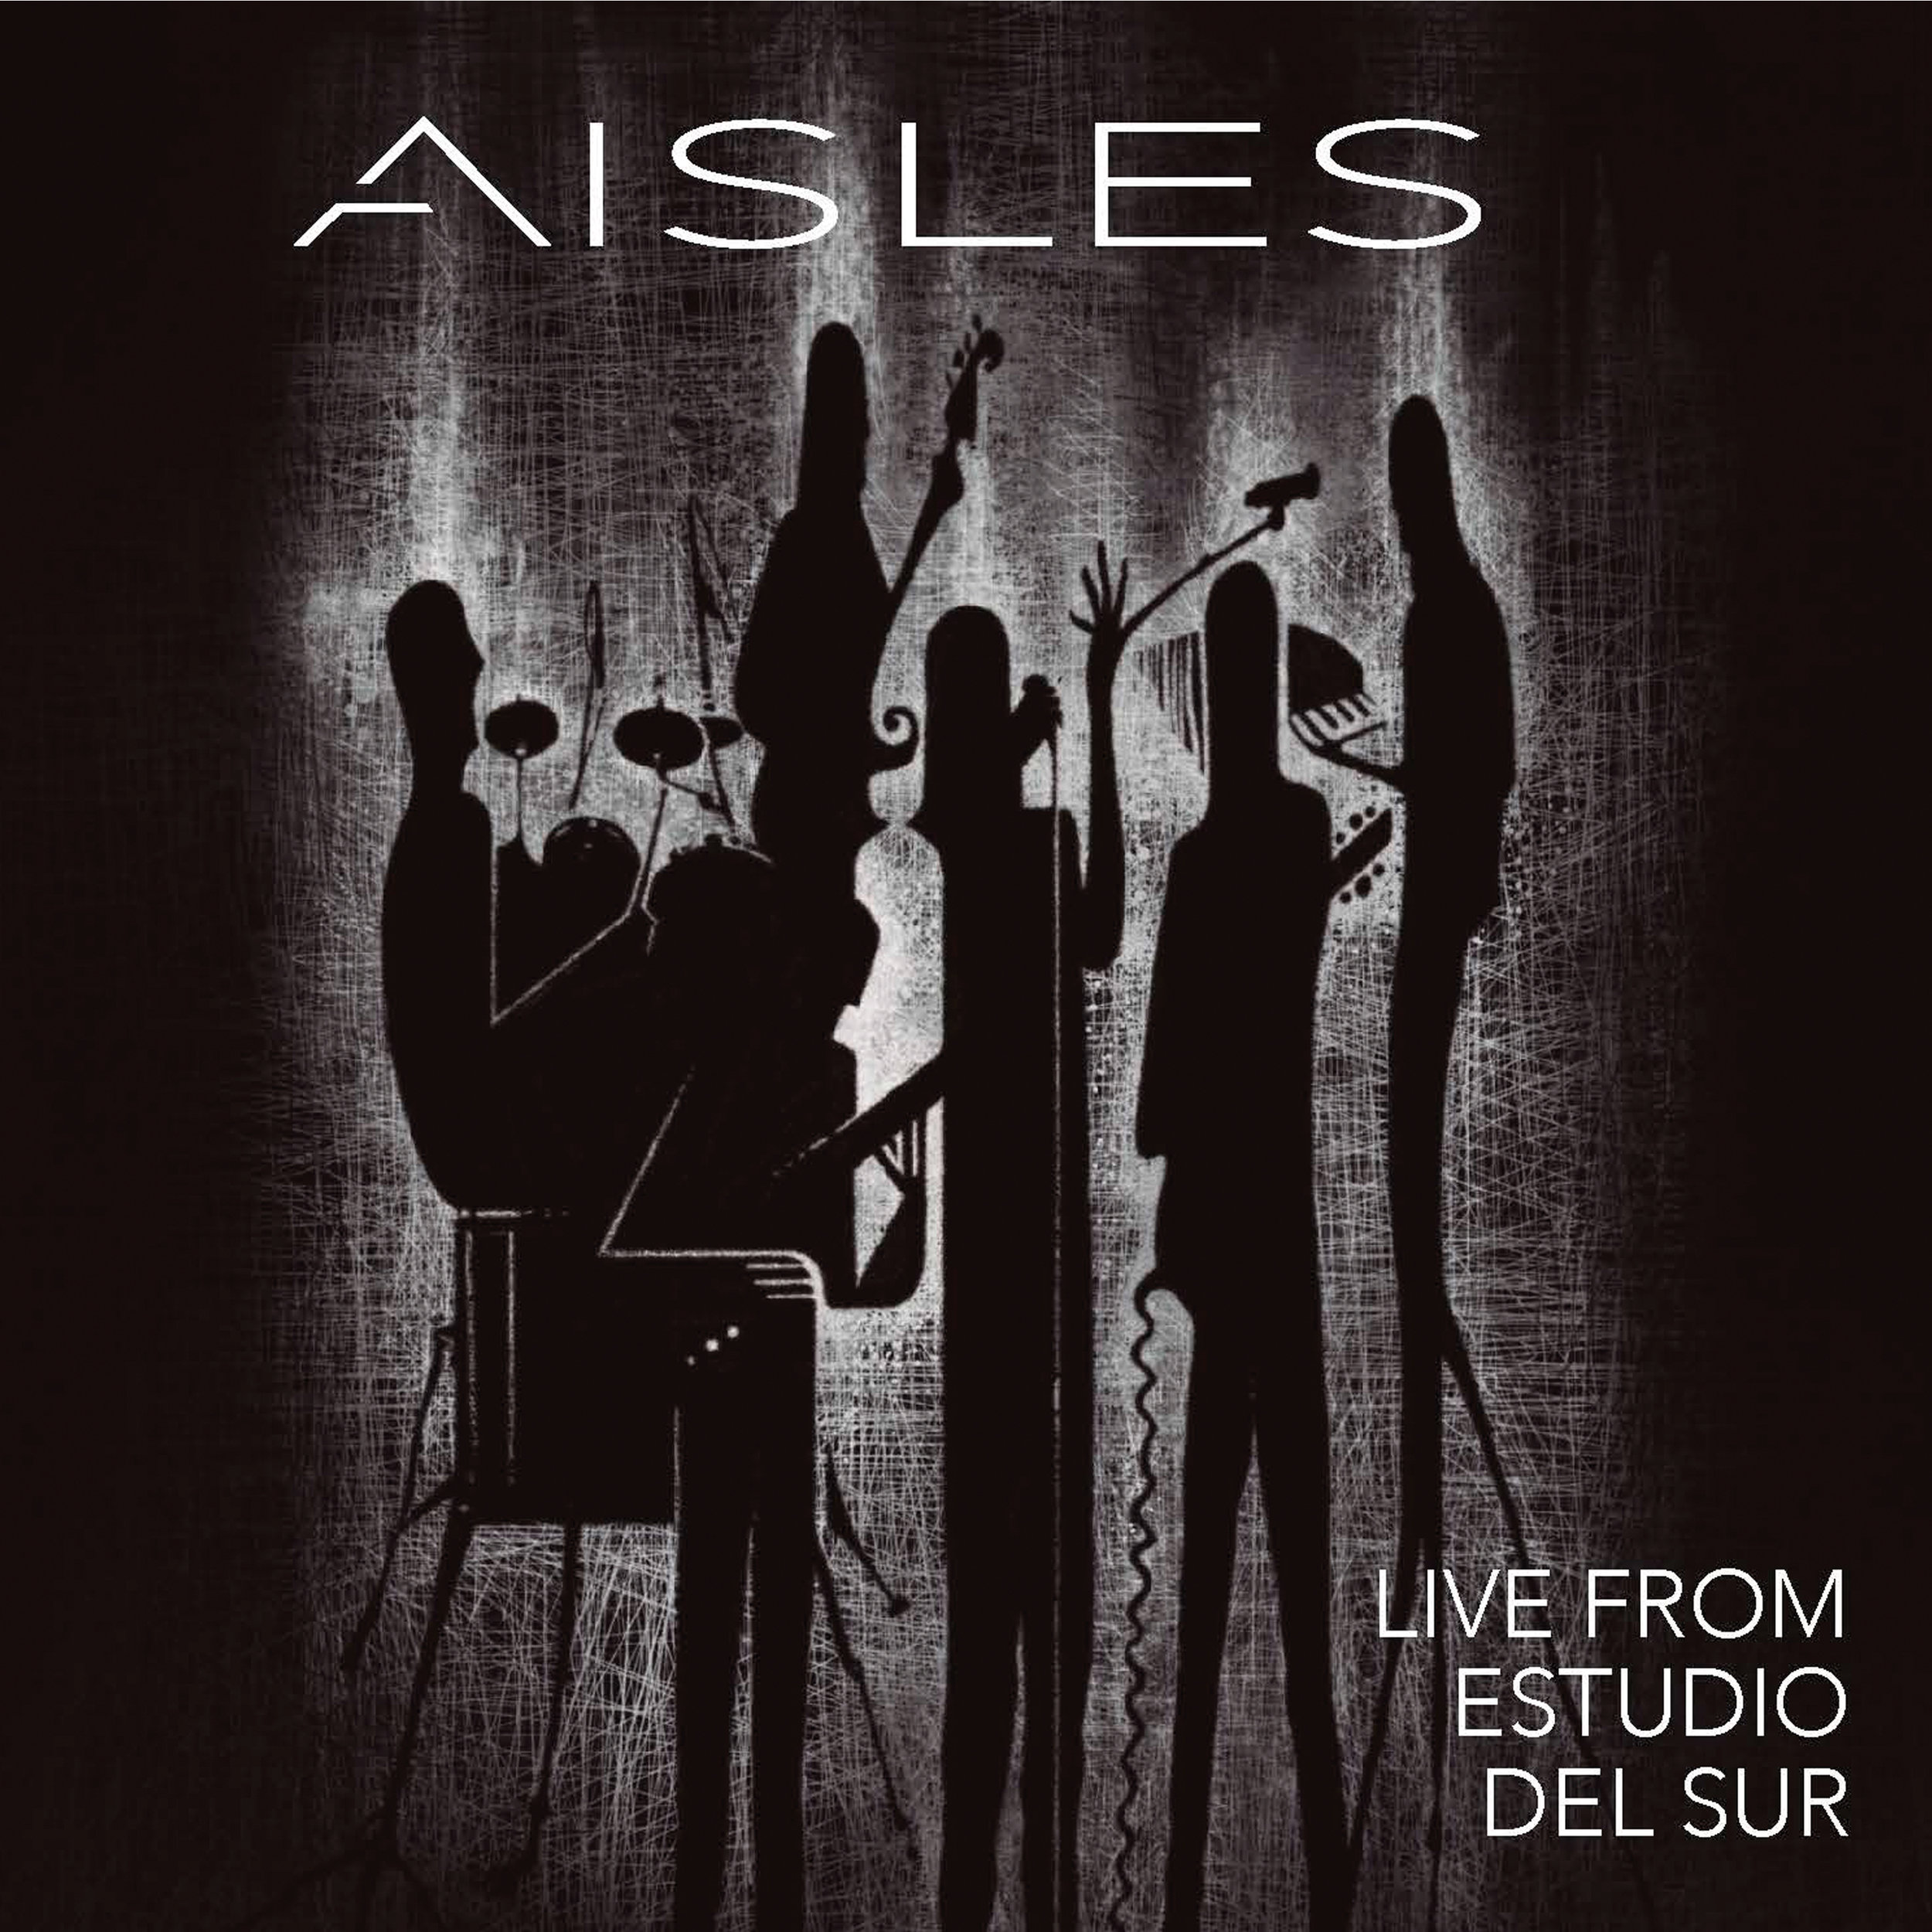 Aisles live from Estudio del Sur cover.jpg